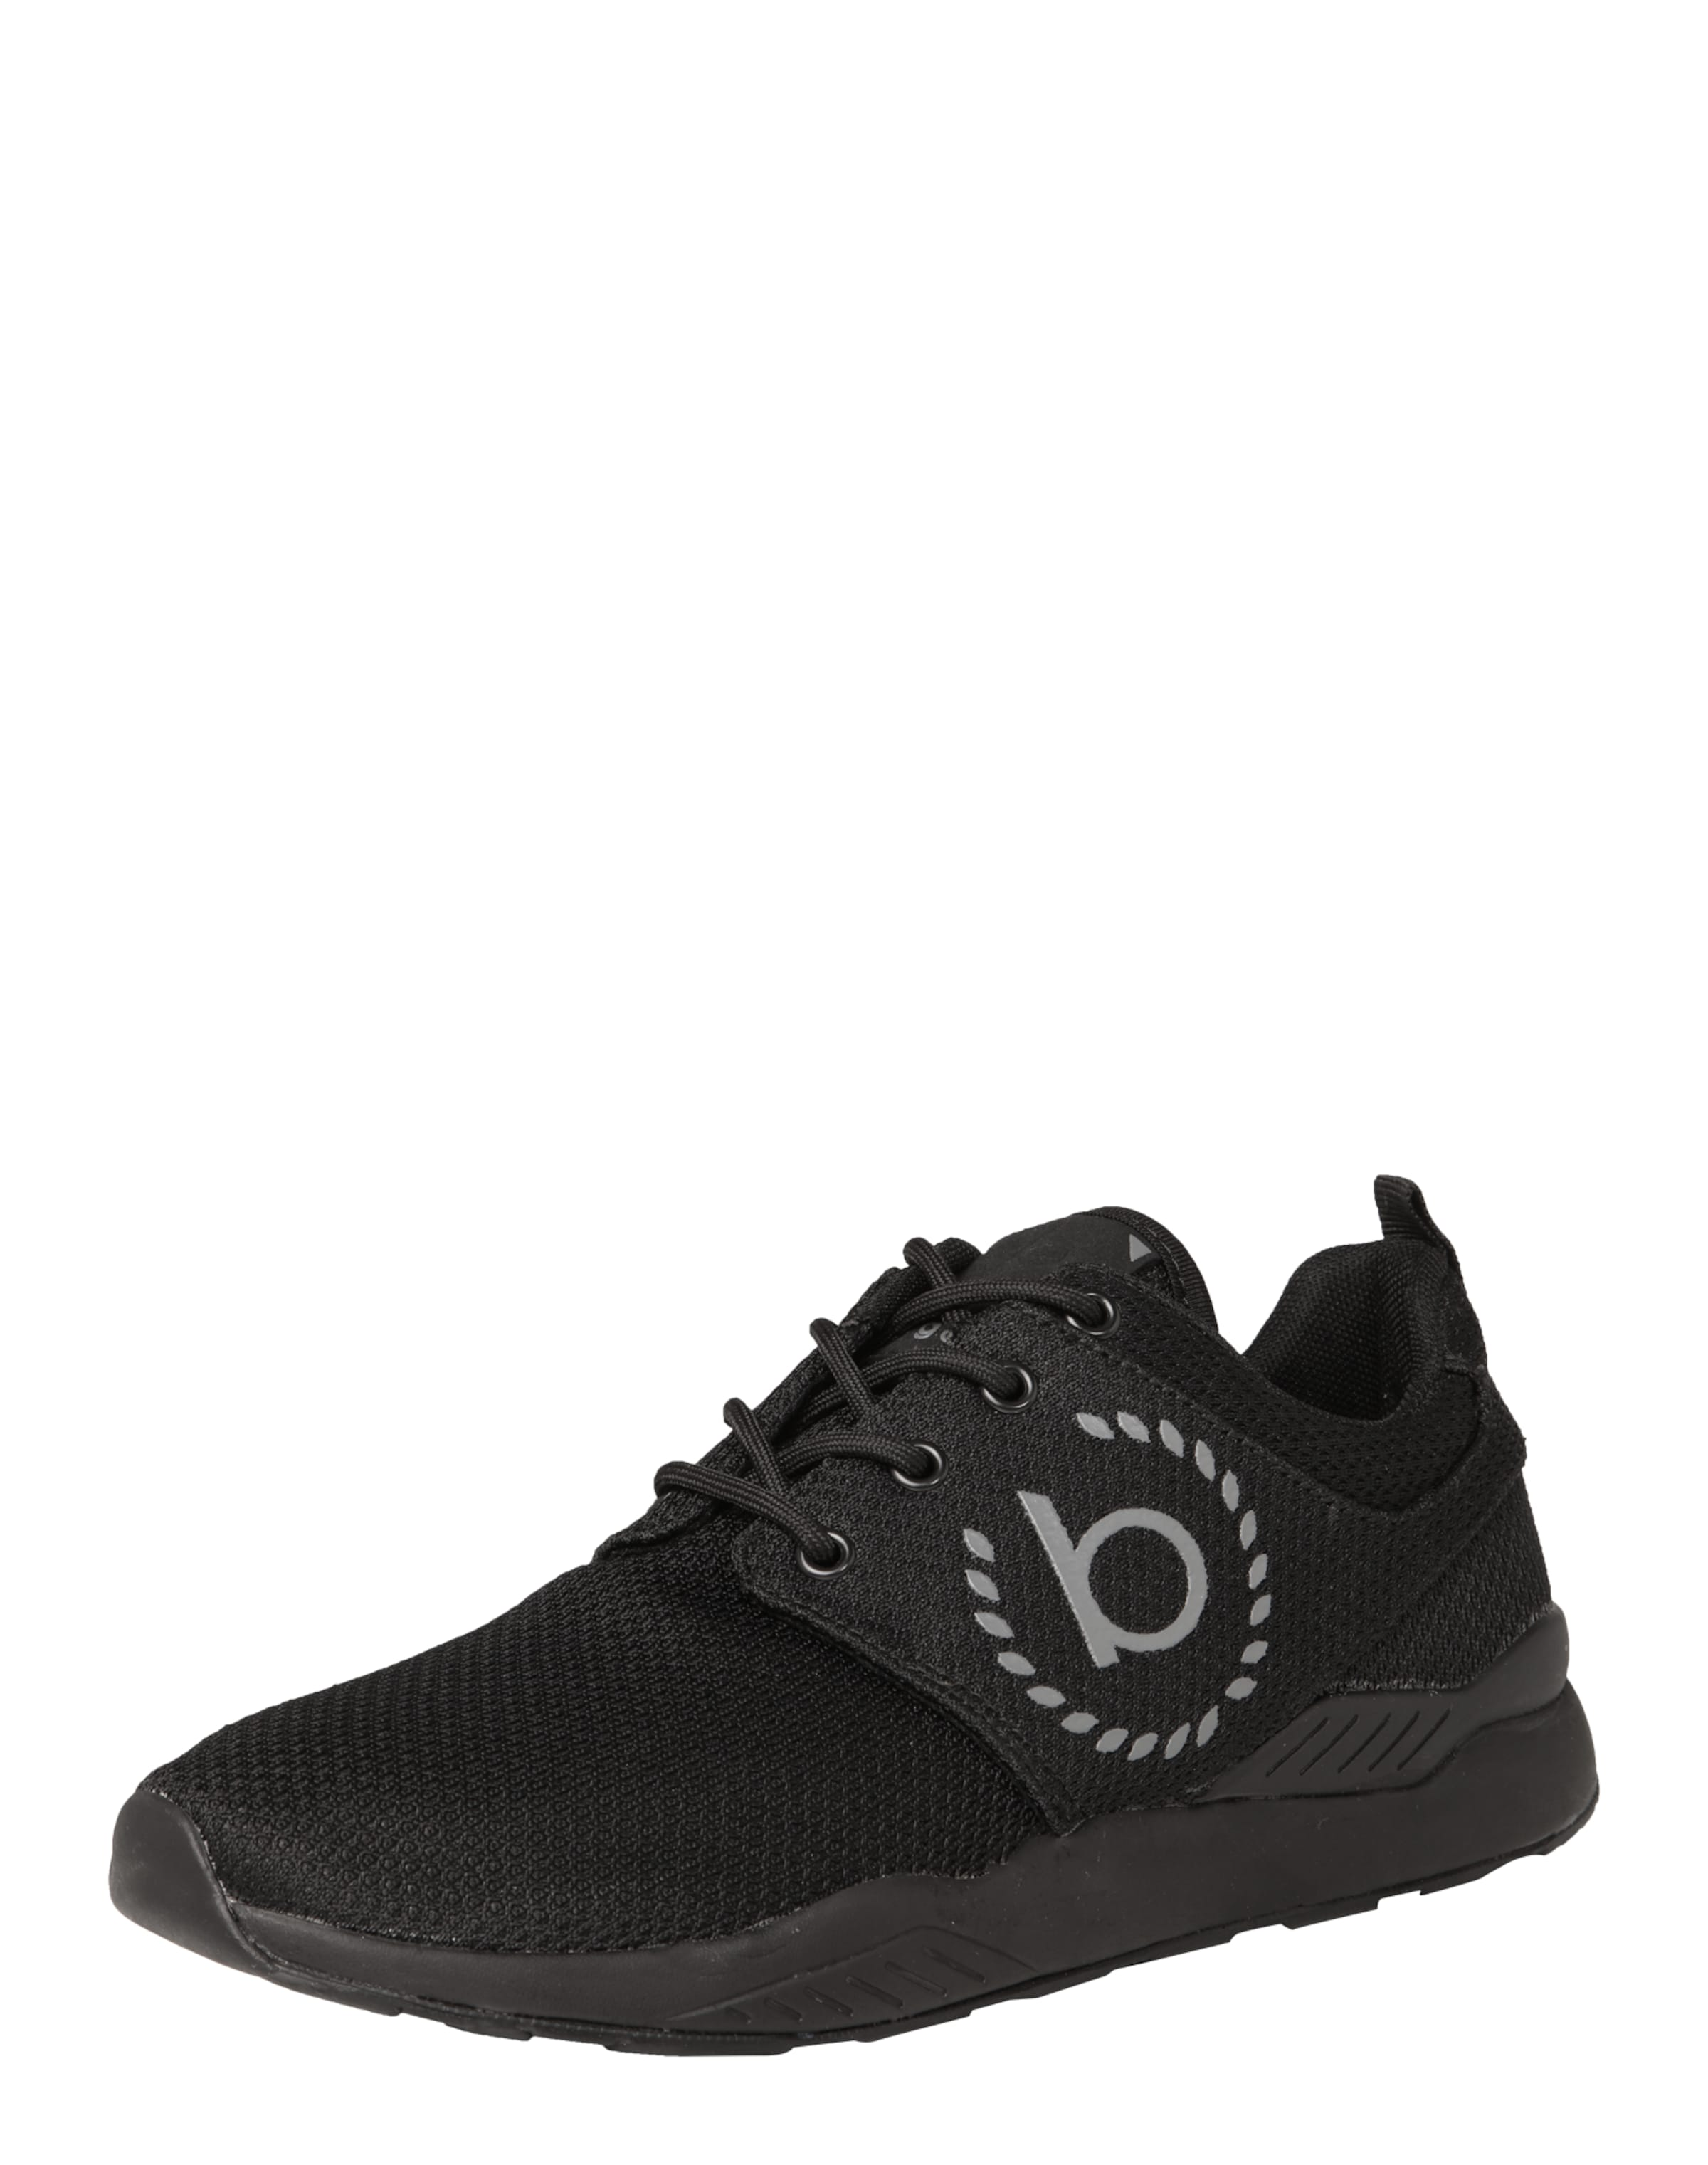 Haltbare Schuhe Mode billige Schuhe bugatti | Sneaker Schuhe Haltbare Gut getragene Schuhe 49131f